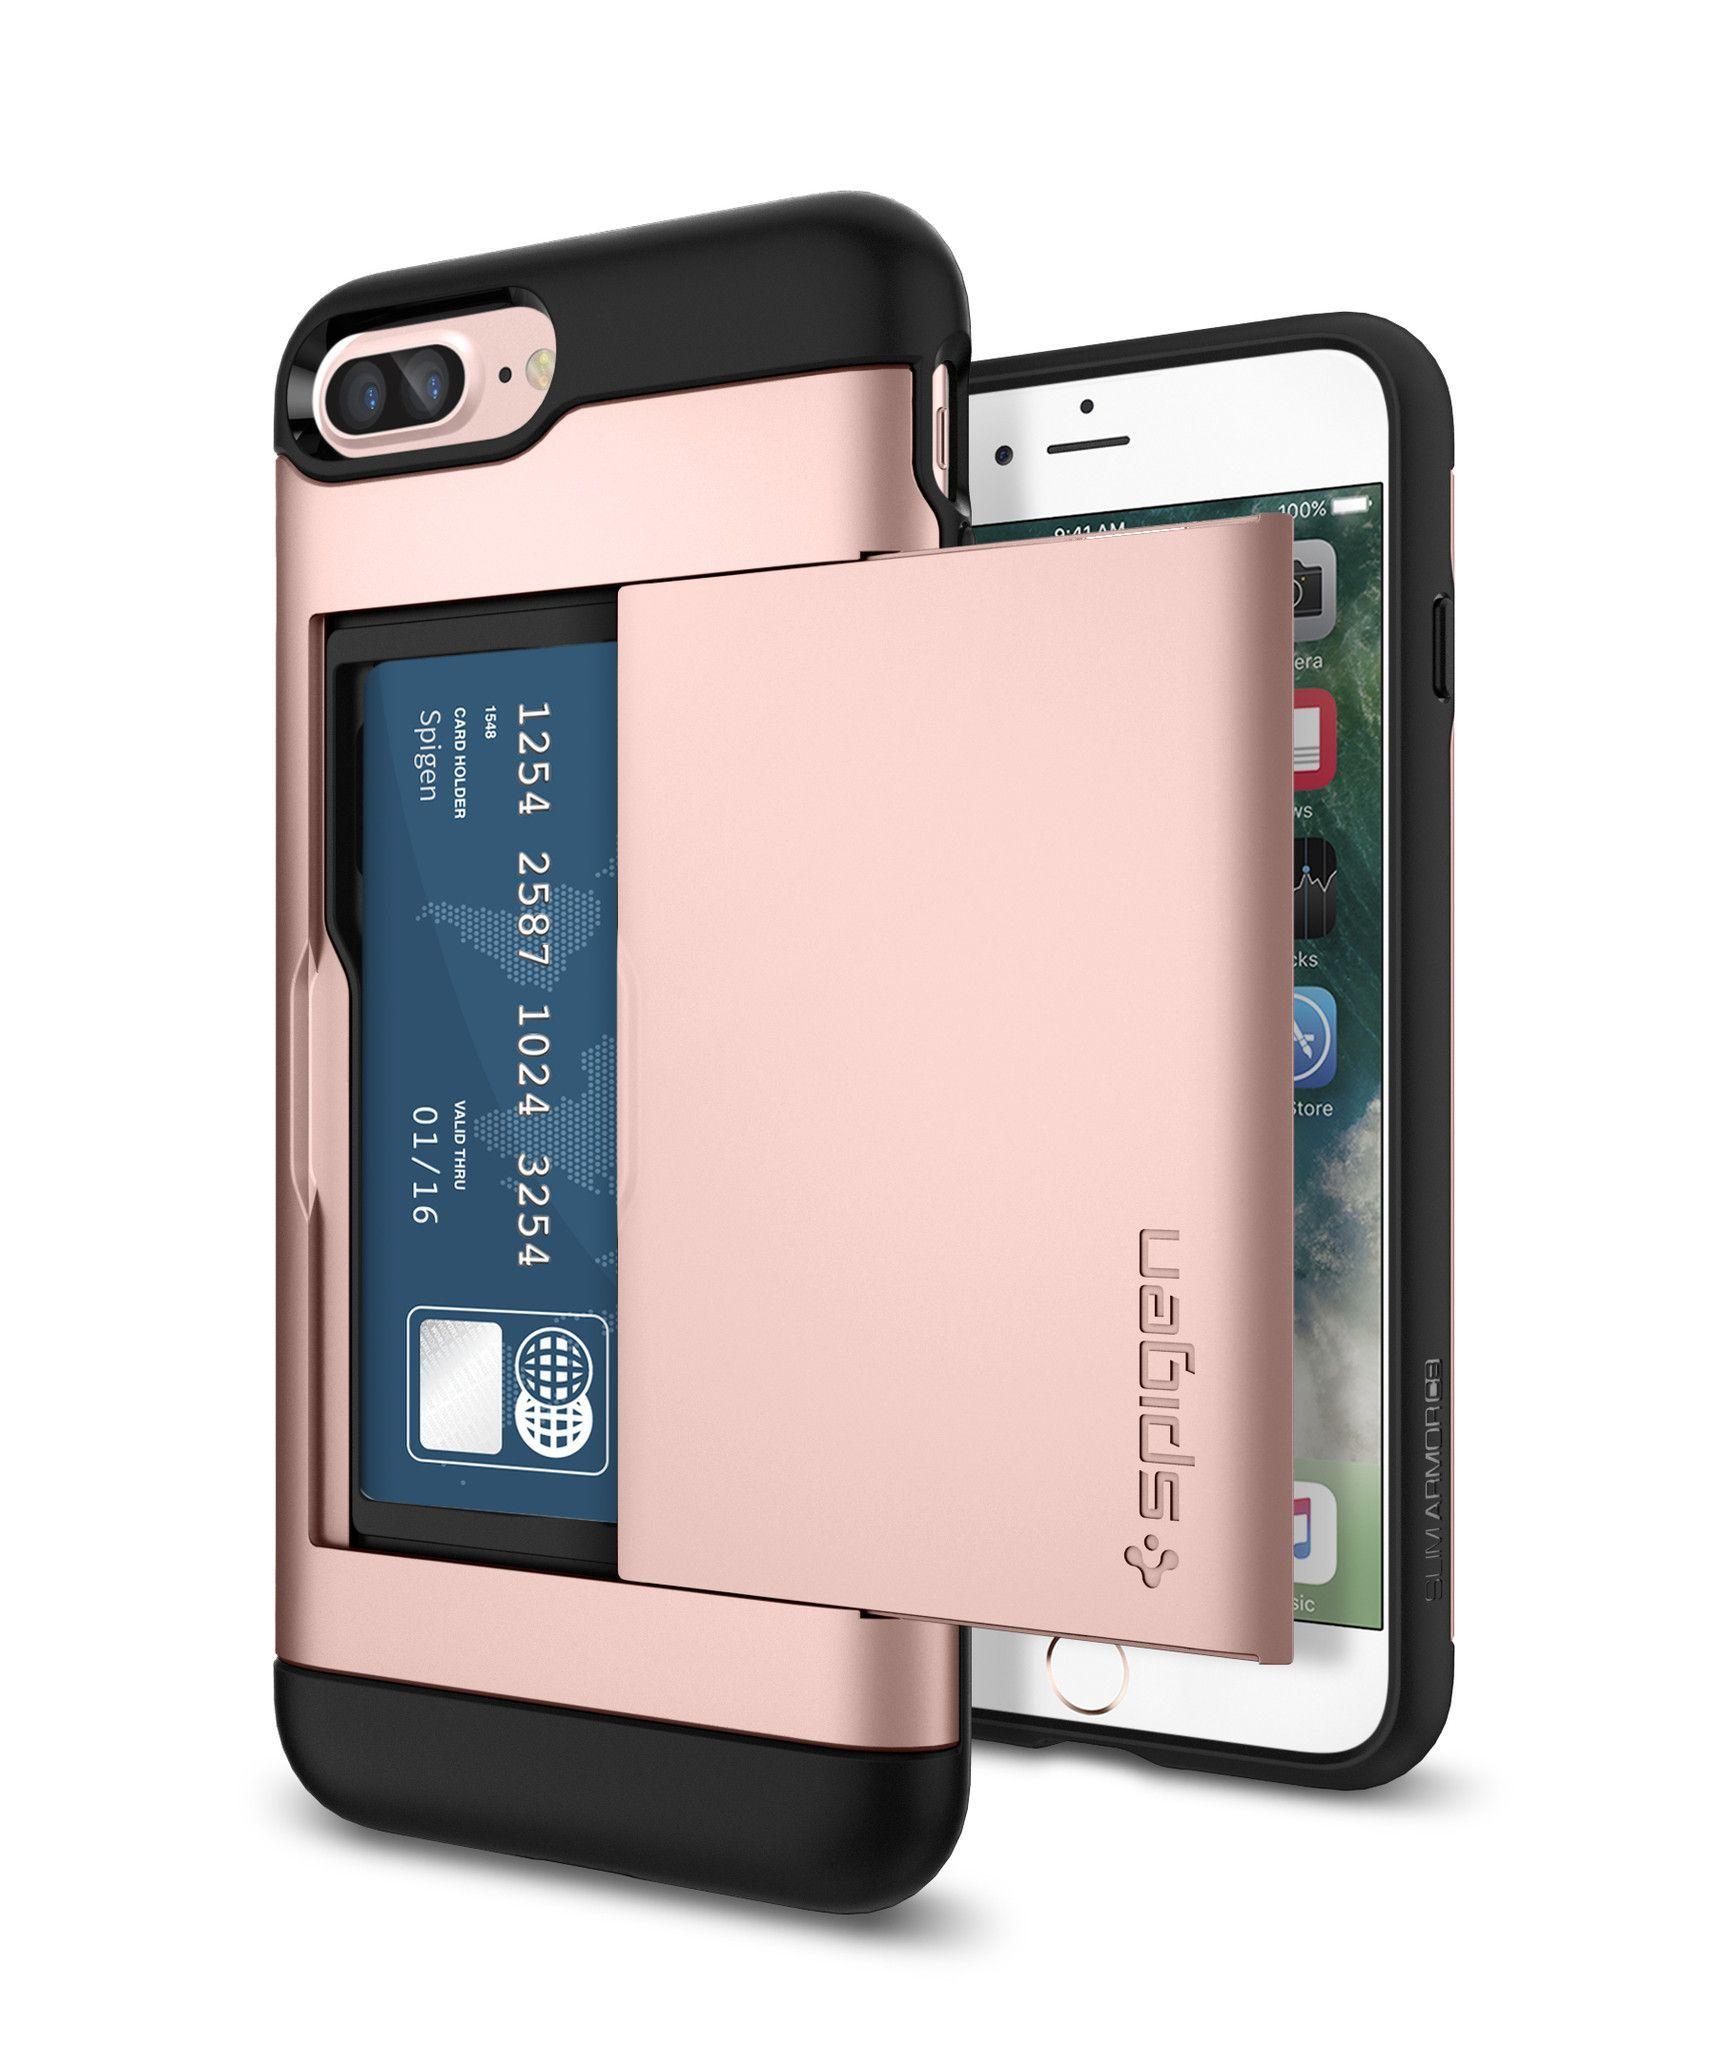 sports shoes 137f4 398b5 iPhone 7 Plus Case Slim Armor CS | Phone accessories | Iphone phone ...